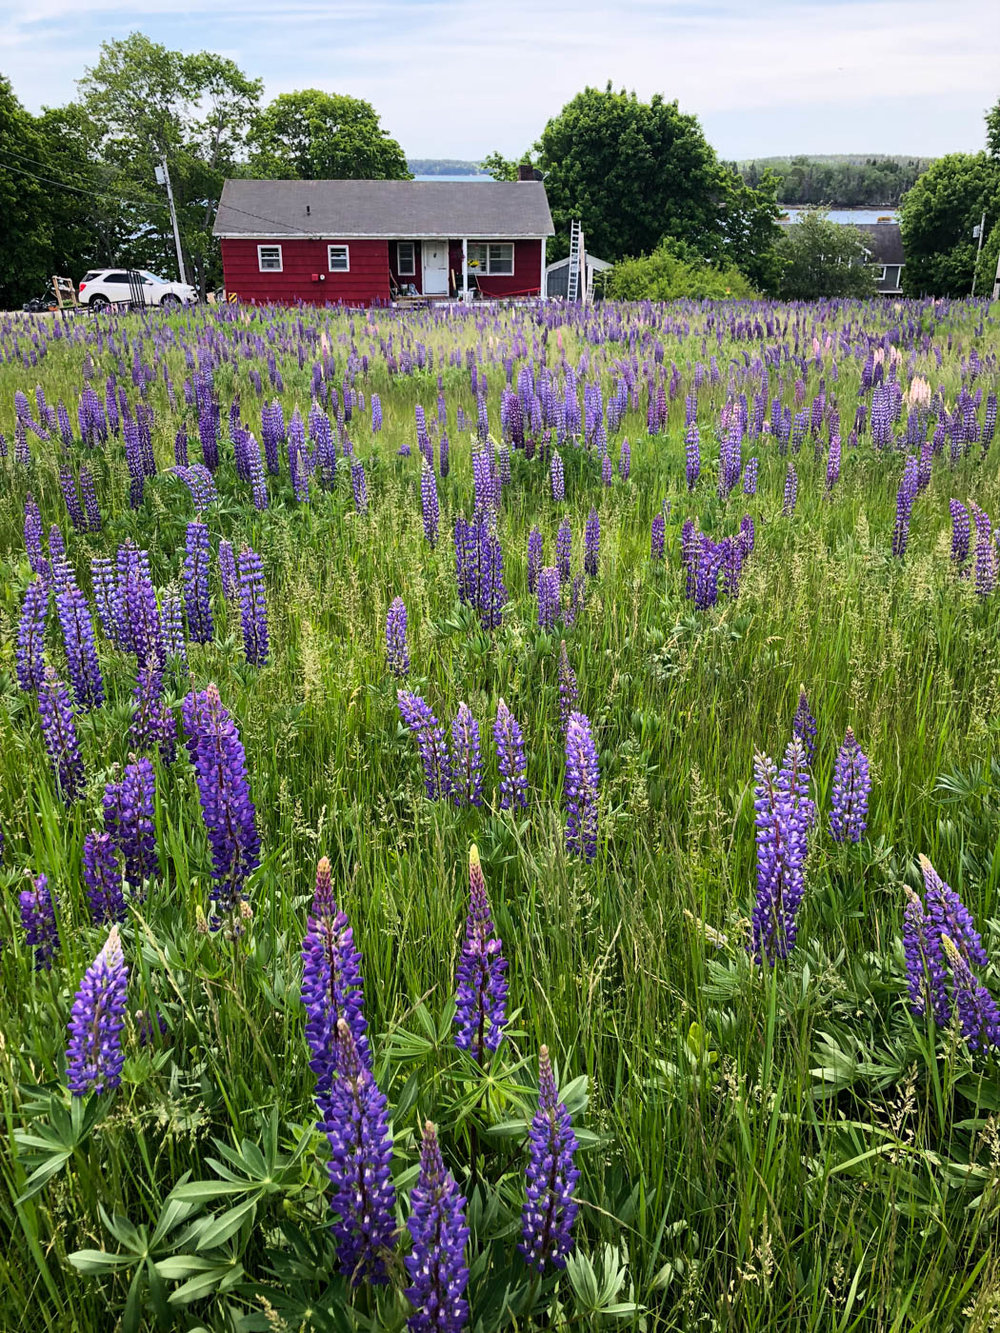 Lupin field in Friendship, Maine.